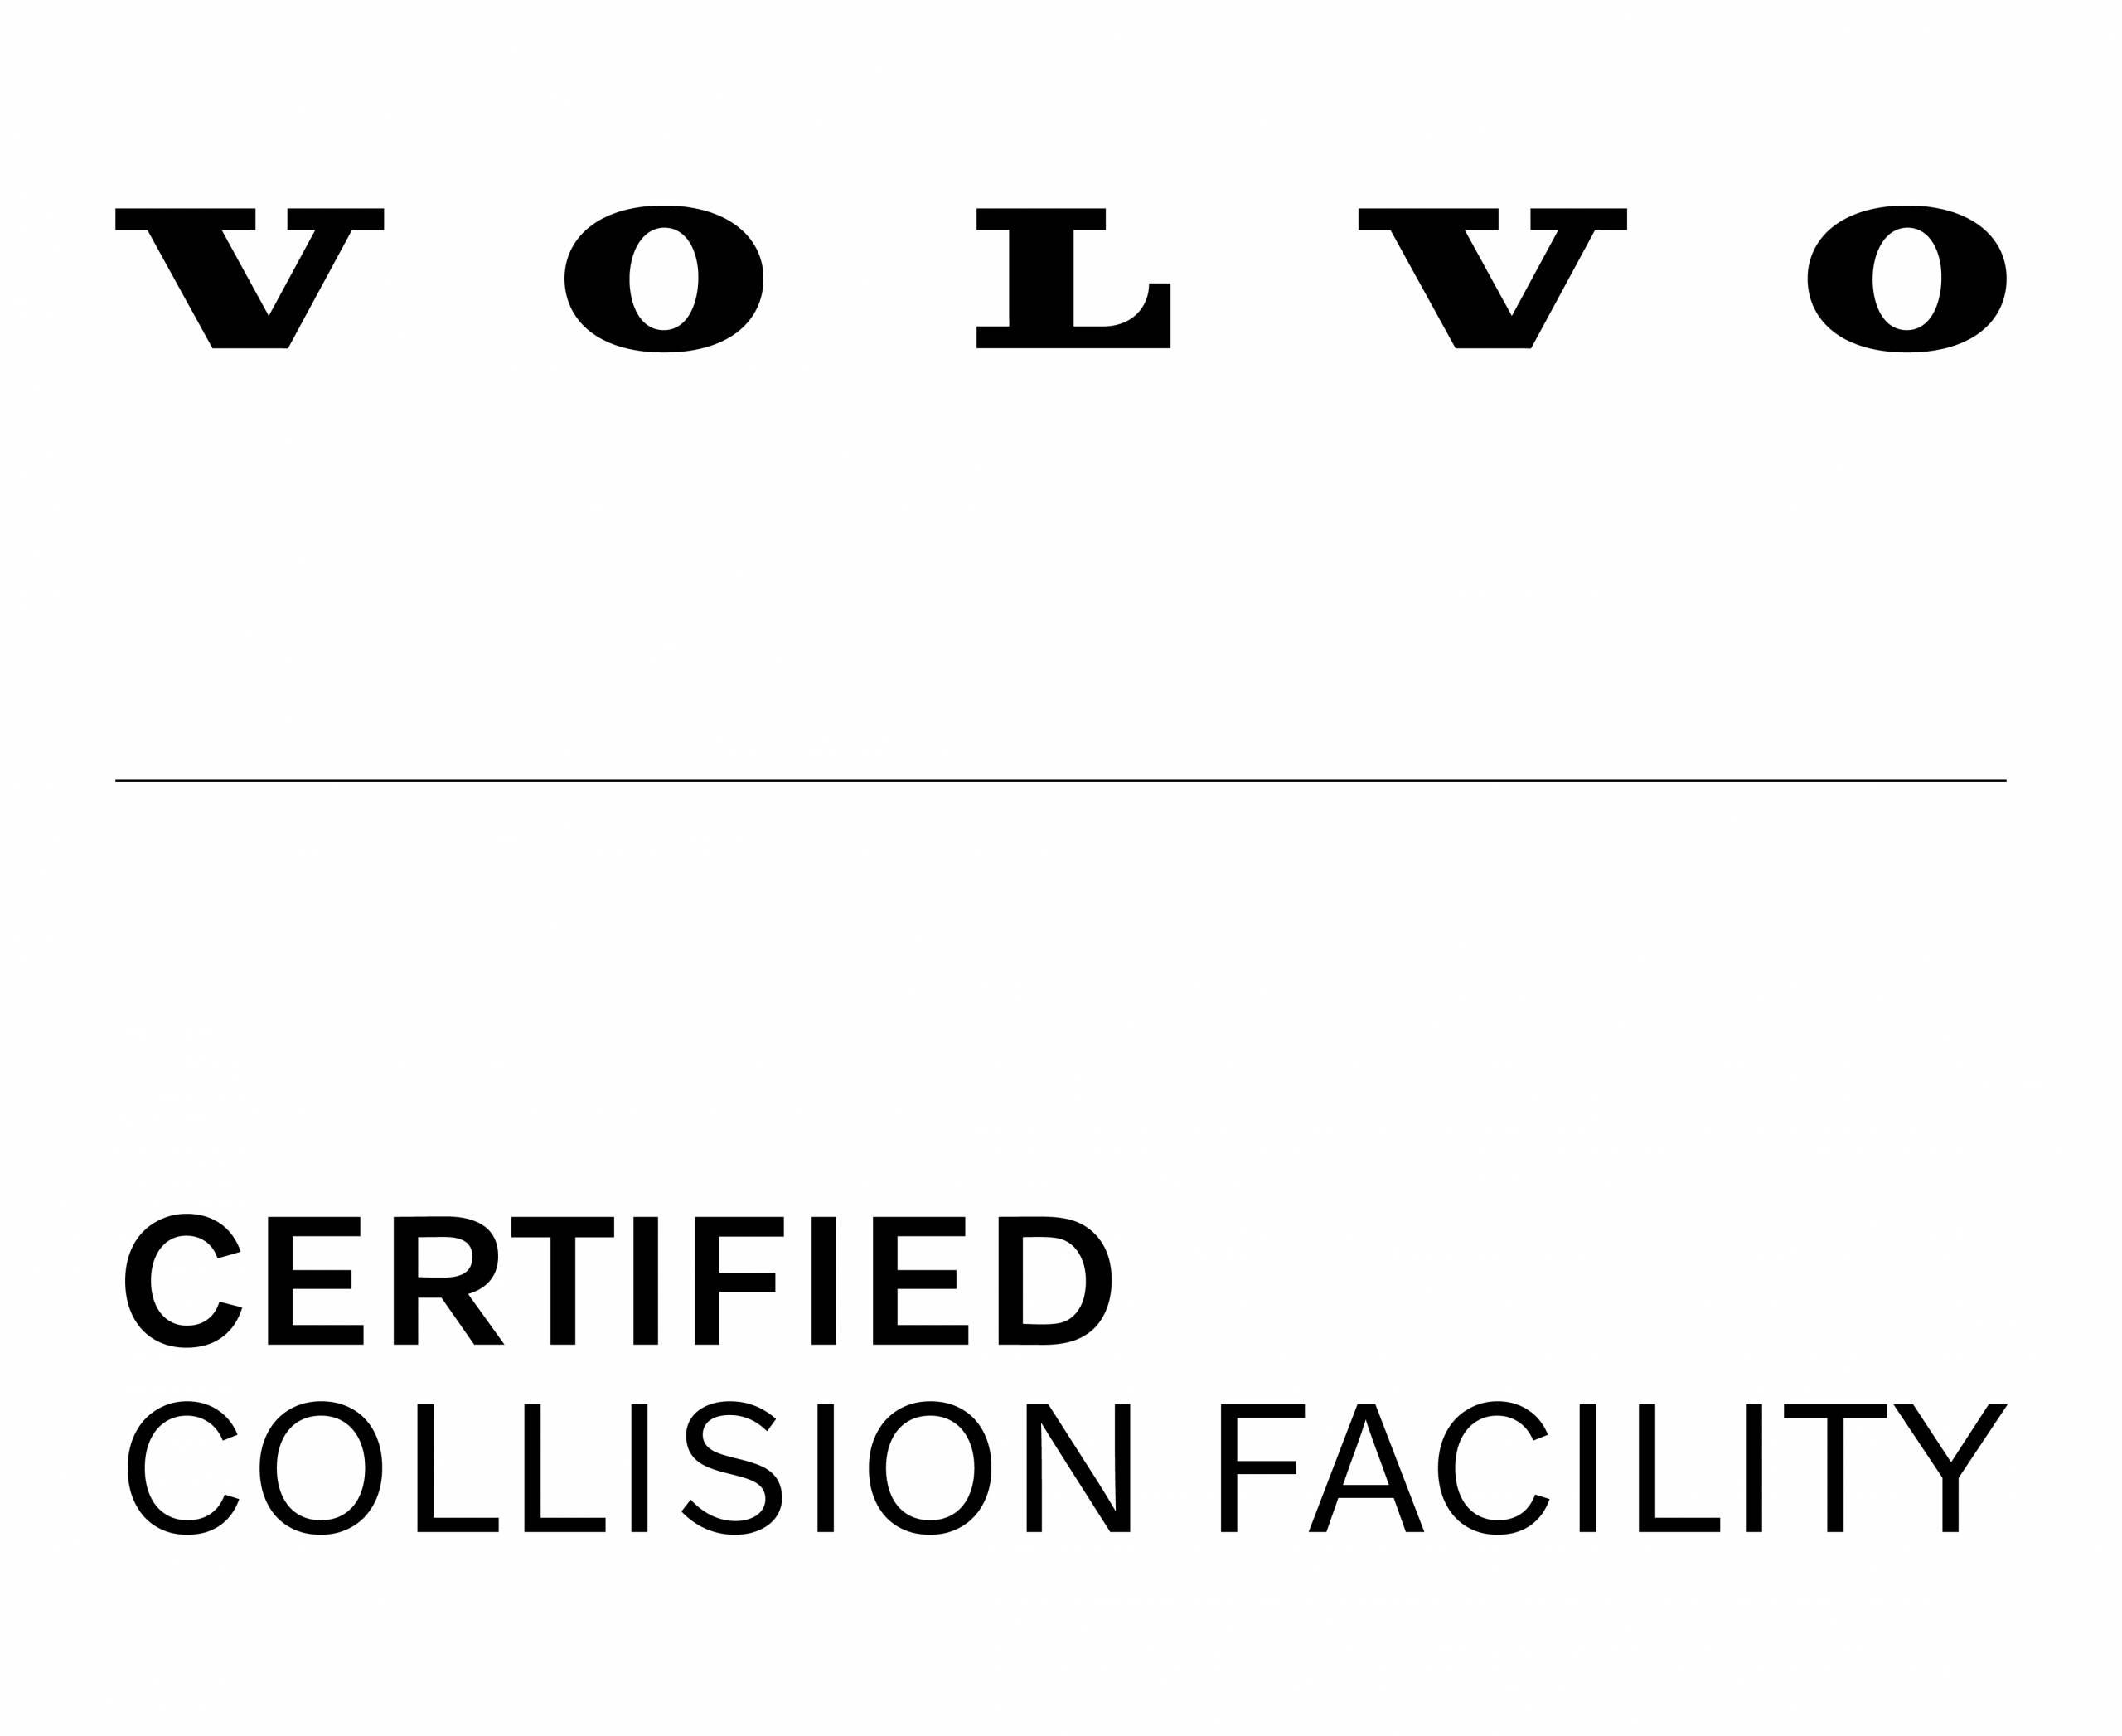 Volvo Certified Collision Facility Walnut Creek  North Main